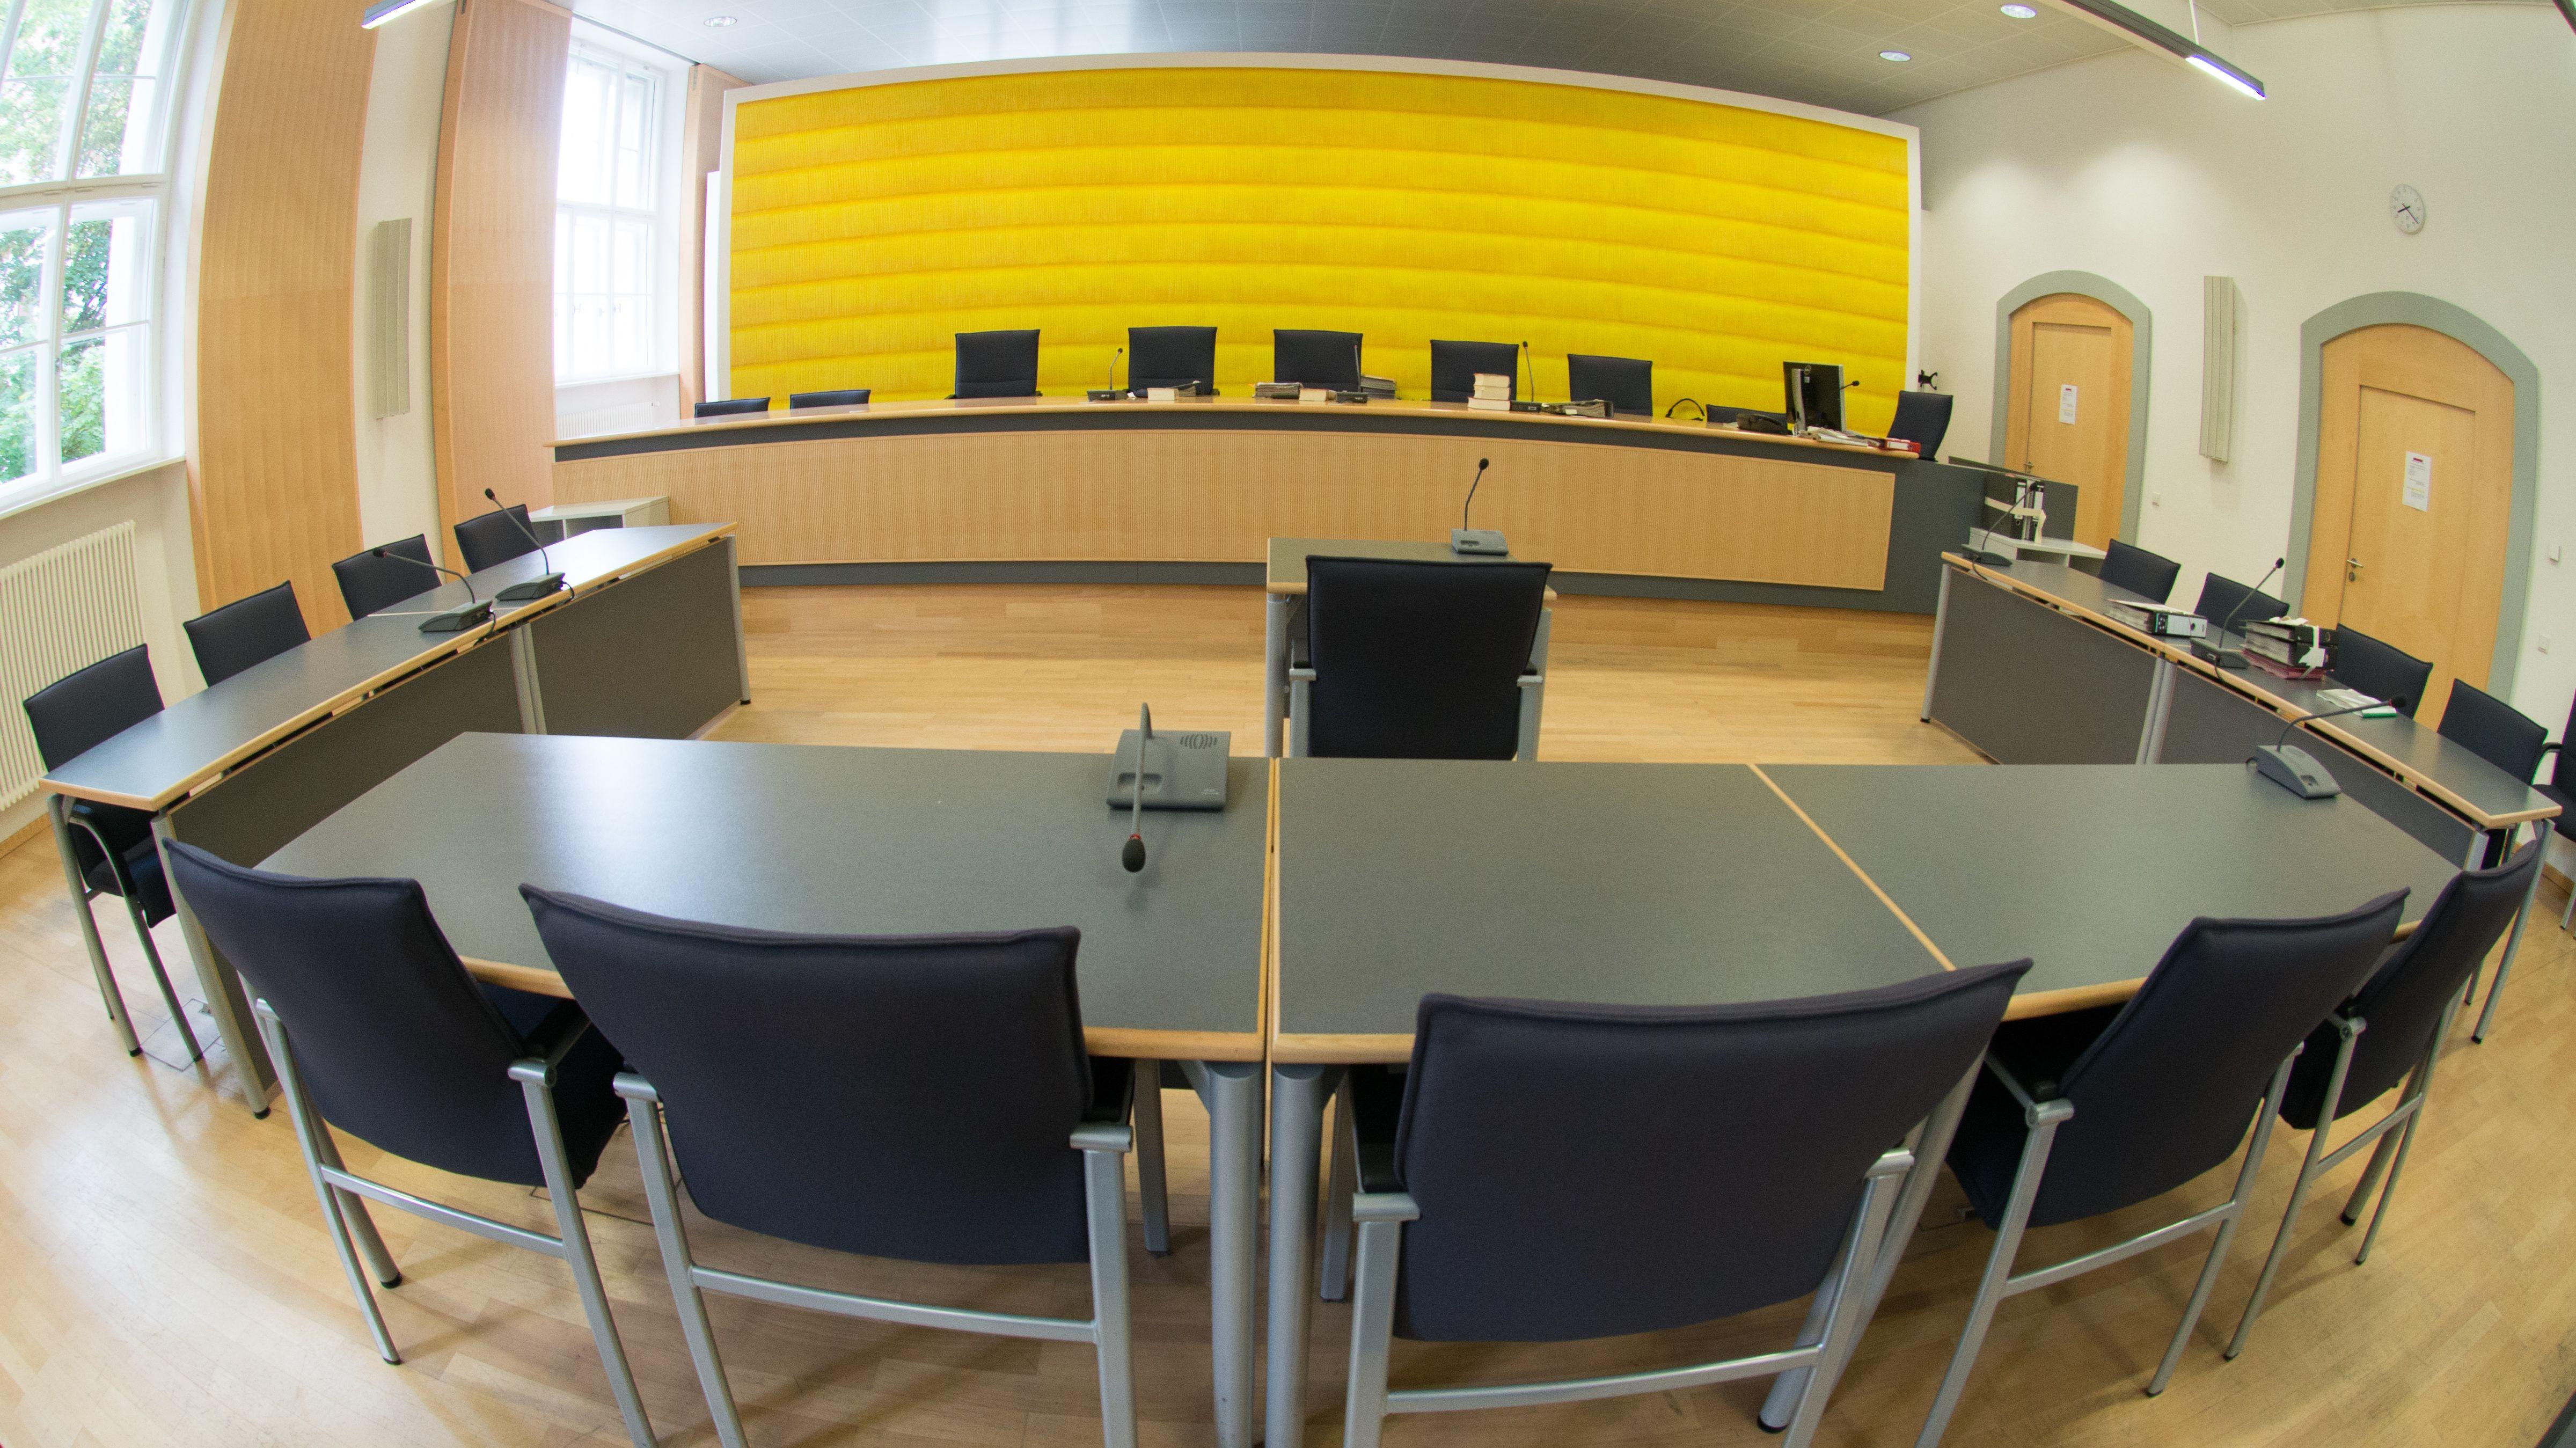 Der leere Gerichtssaal des Landgerichts Regensburg